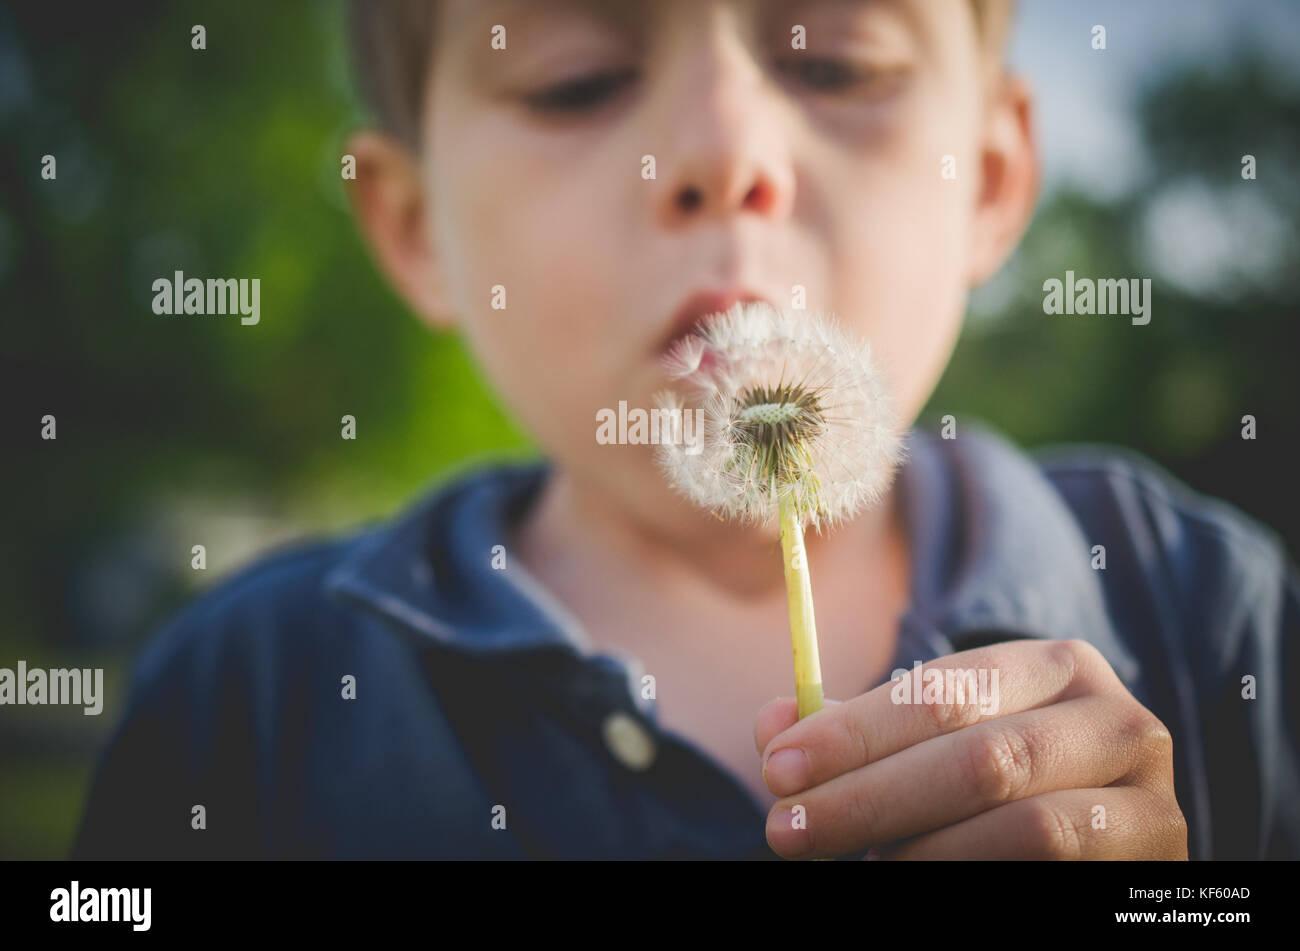 6-7 ans boy blowing dandelion Photo Stock